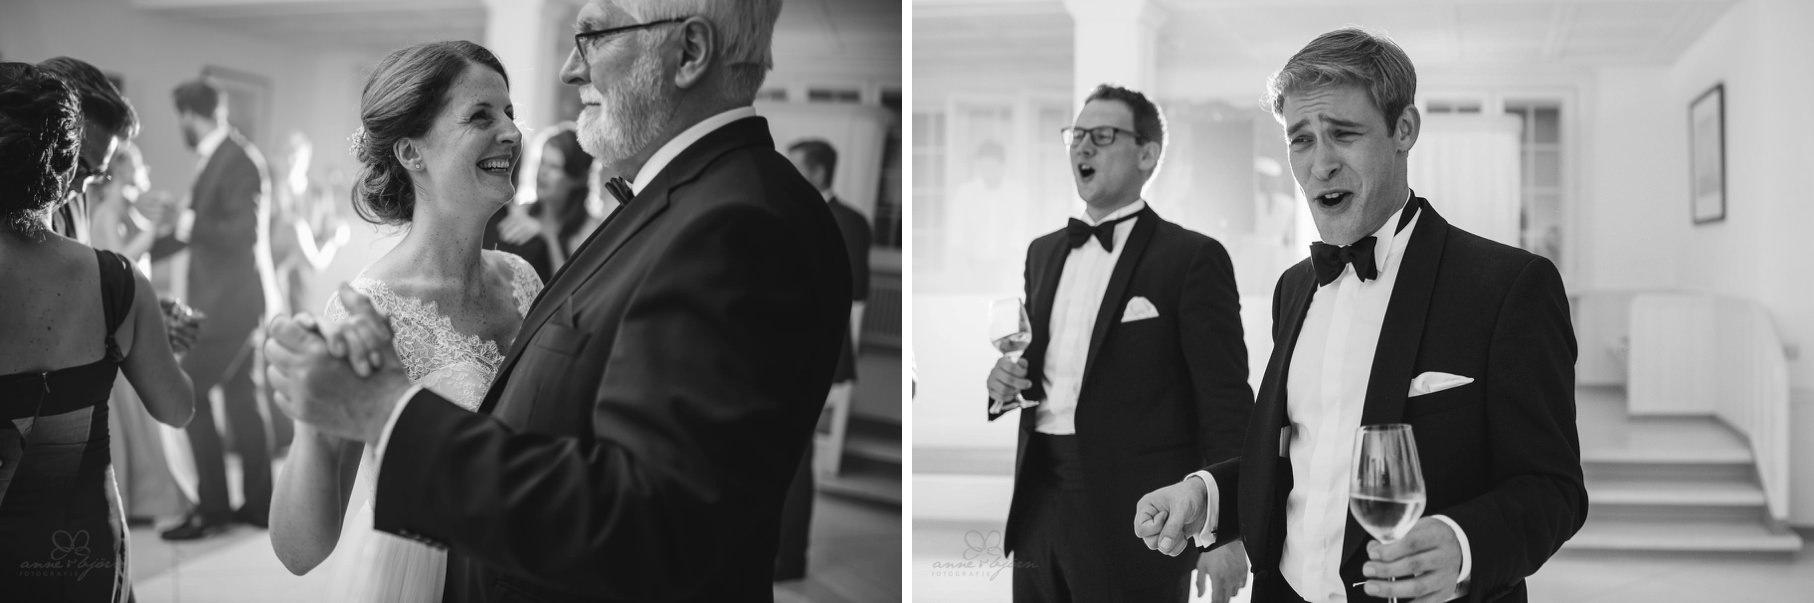 0099 aud blog d75 3431 - Hochzeit an der Hamburger Elbe - Ann-Katrin & Daniel